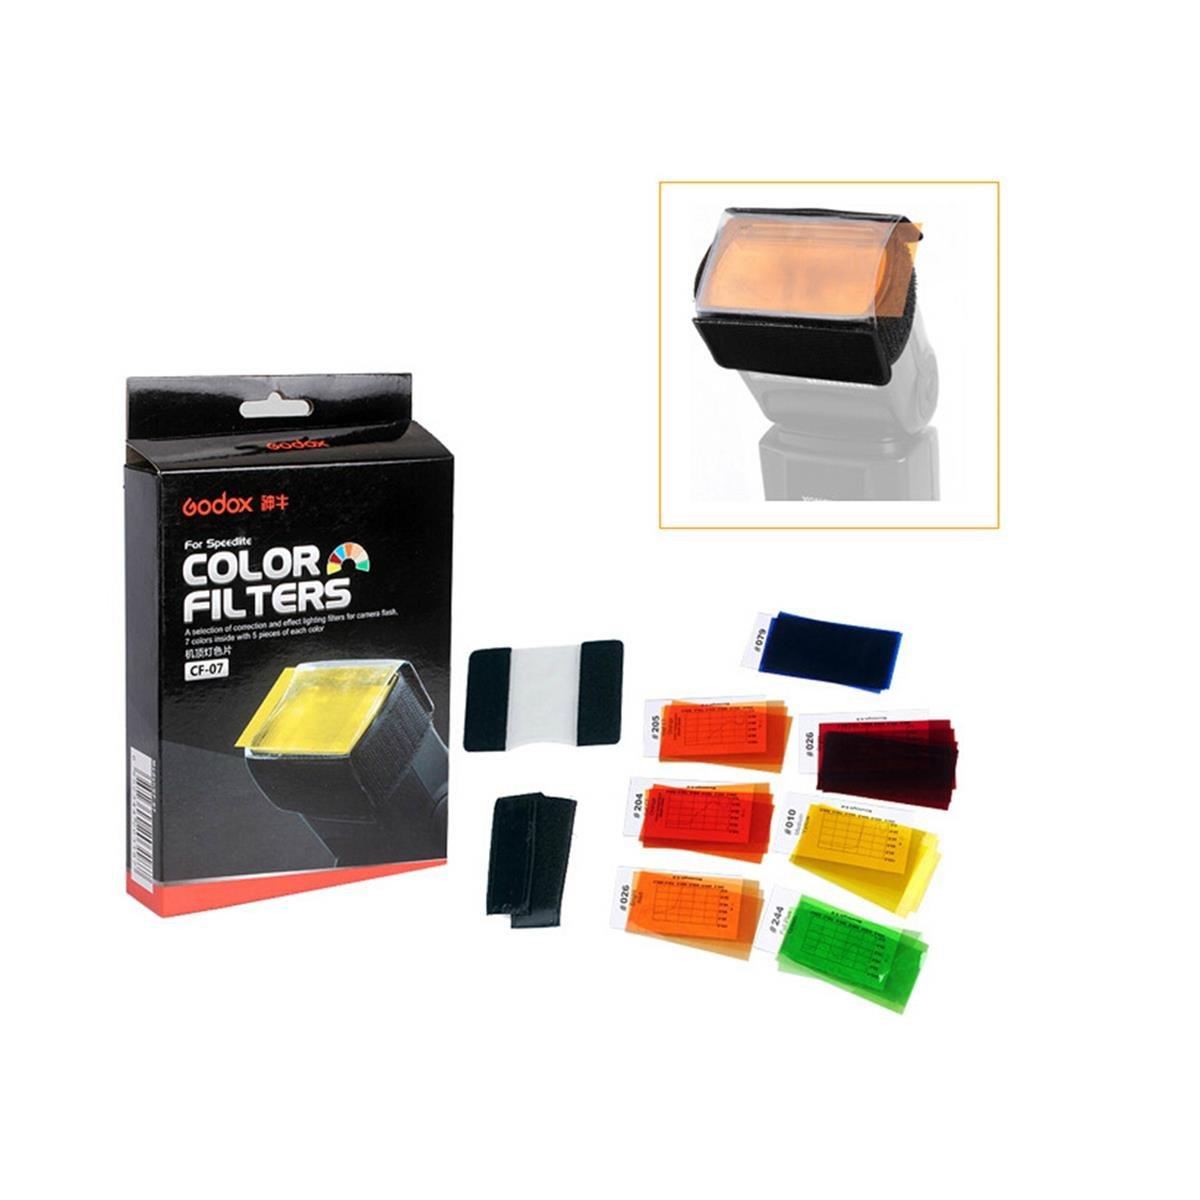 Godox CF-07 Universal Speedlite Color Filter Kit for Canon Nikon Pentax Godox Yongnuo Flash Light Andoer Trams-13194